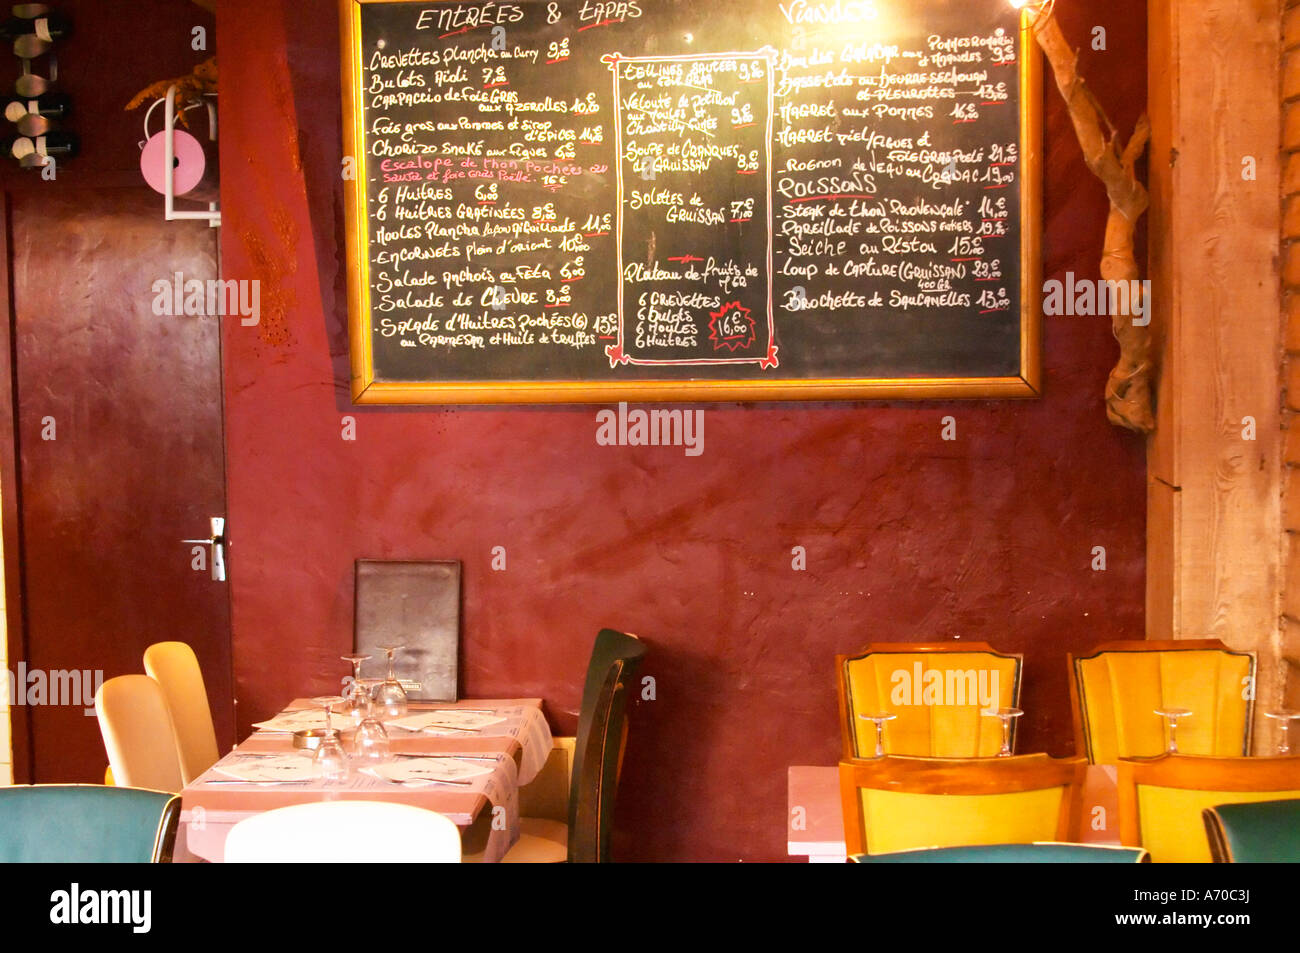 La Cranquette Restaurant Gruissan France